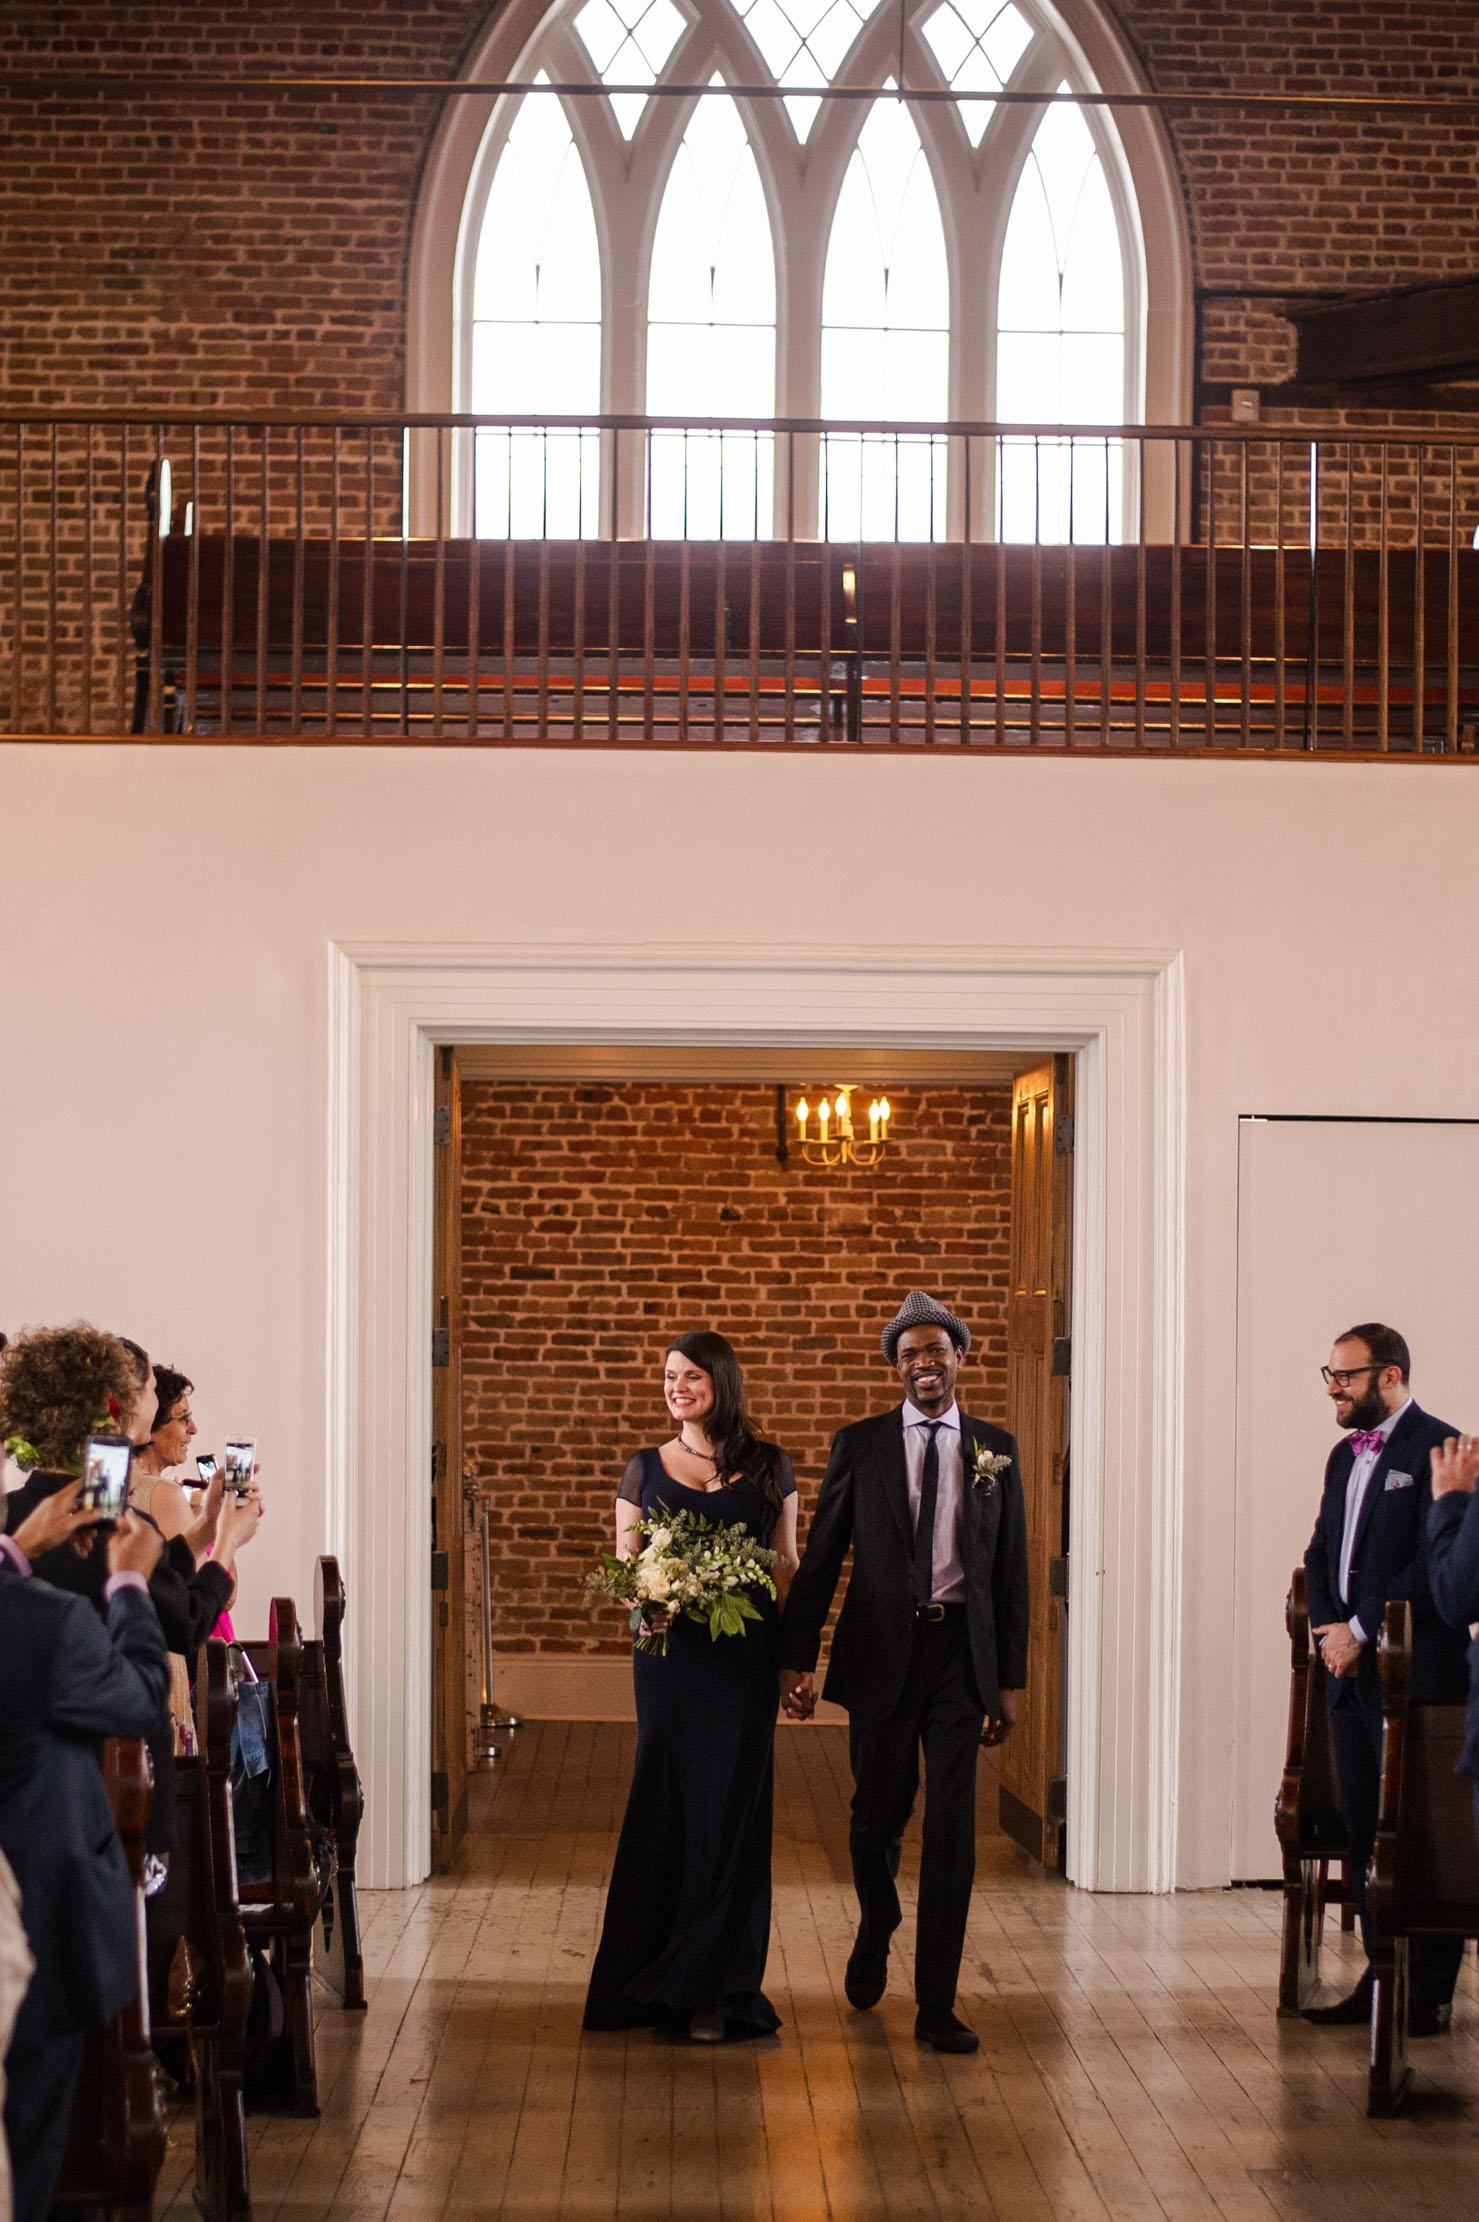 NOLA-Felicity-Church-Ace-Hotel-Wedding-1066.jpg